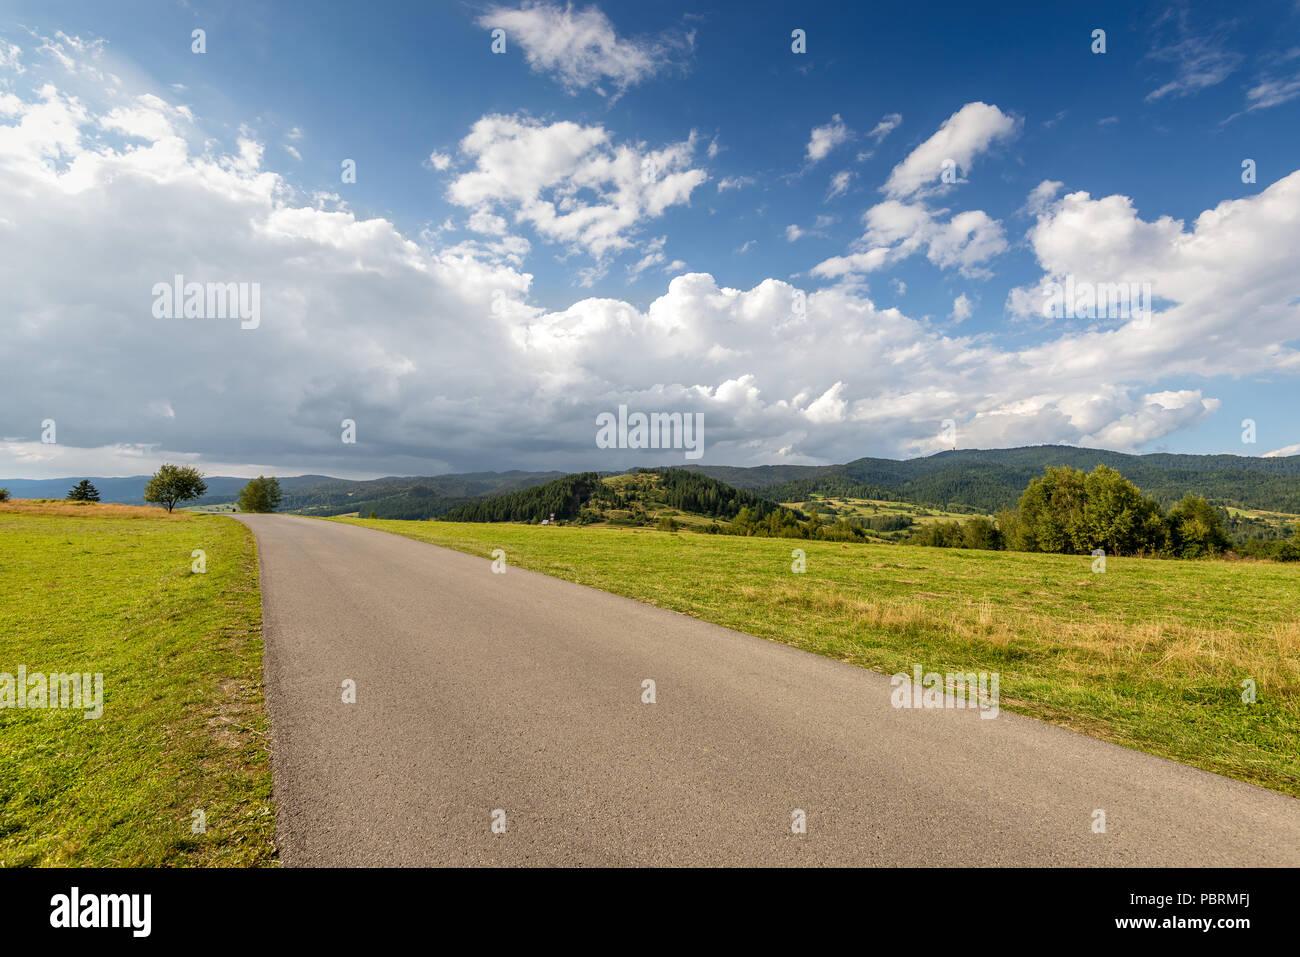 Asphalt road in Pieniny National Park. Malopolska, Poland. - Stock Image